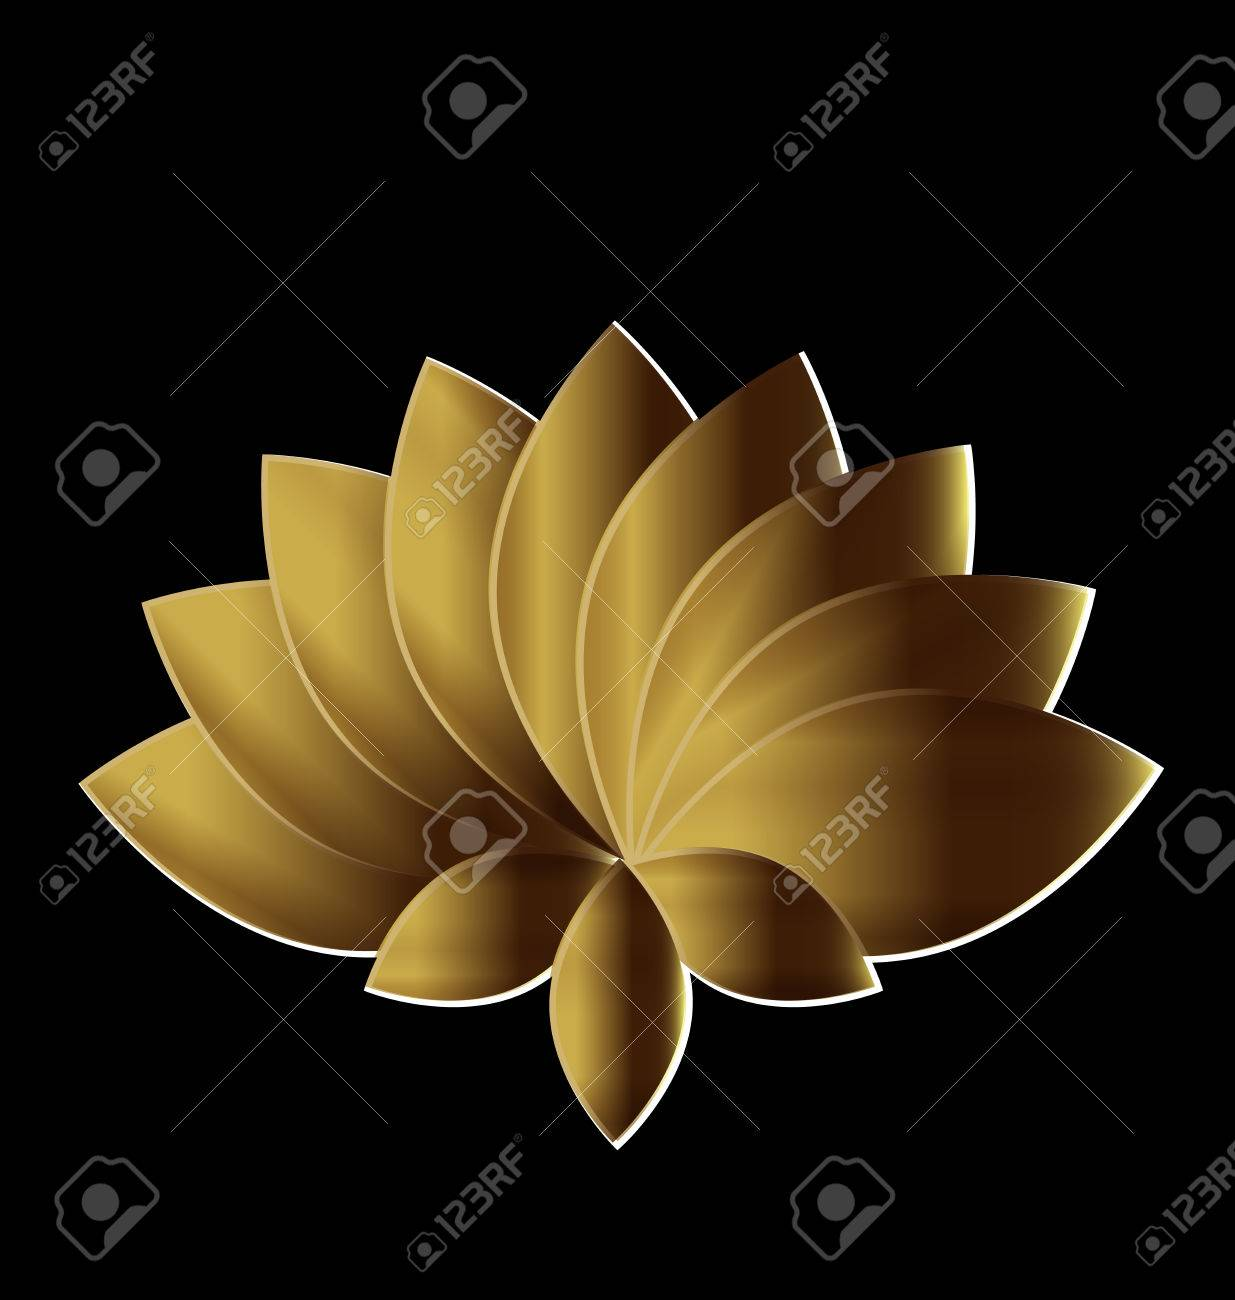 Lotus Symbol Gold Flower Logo Art Royalty Free Cliparts Vectors